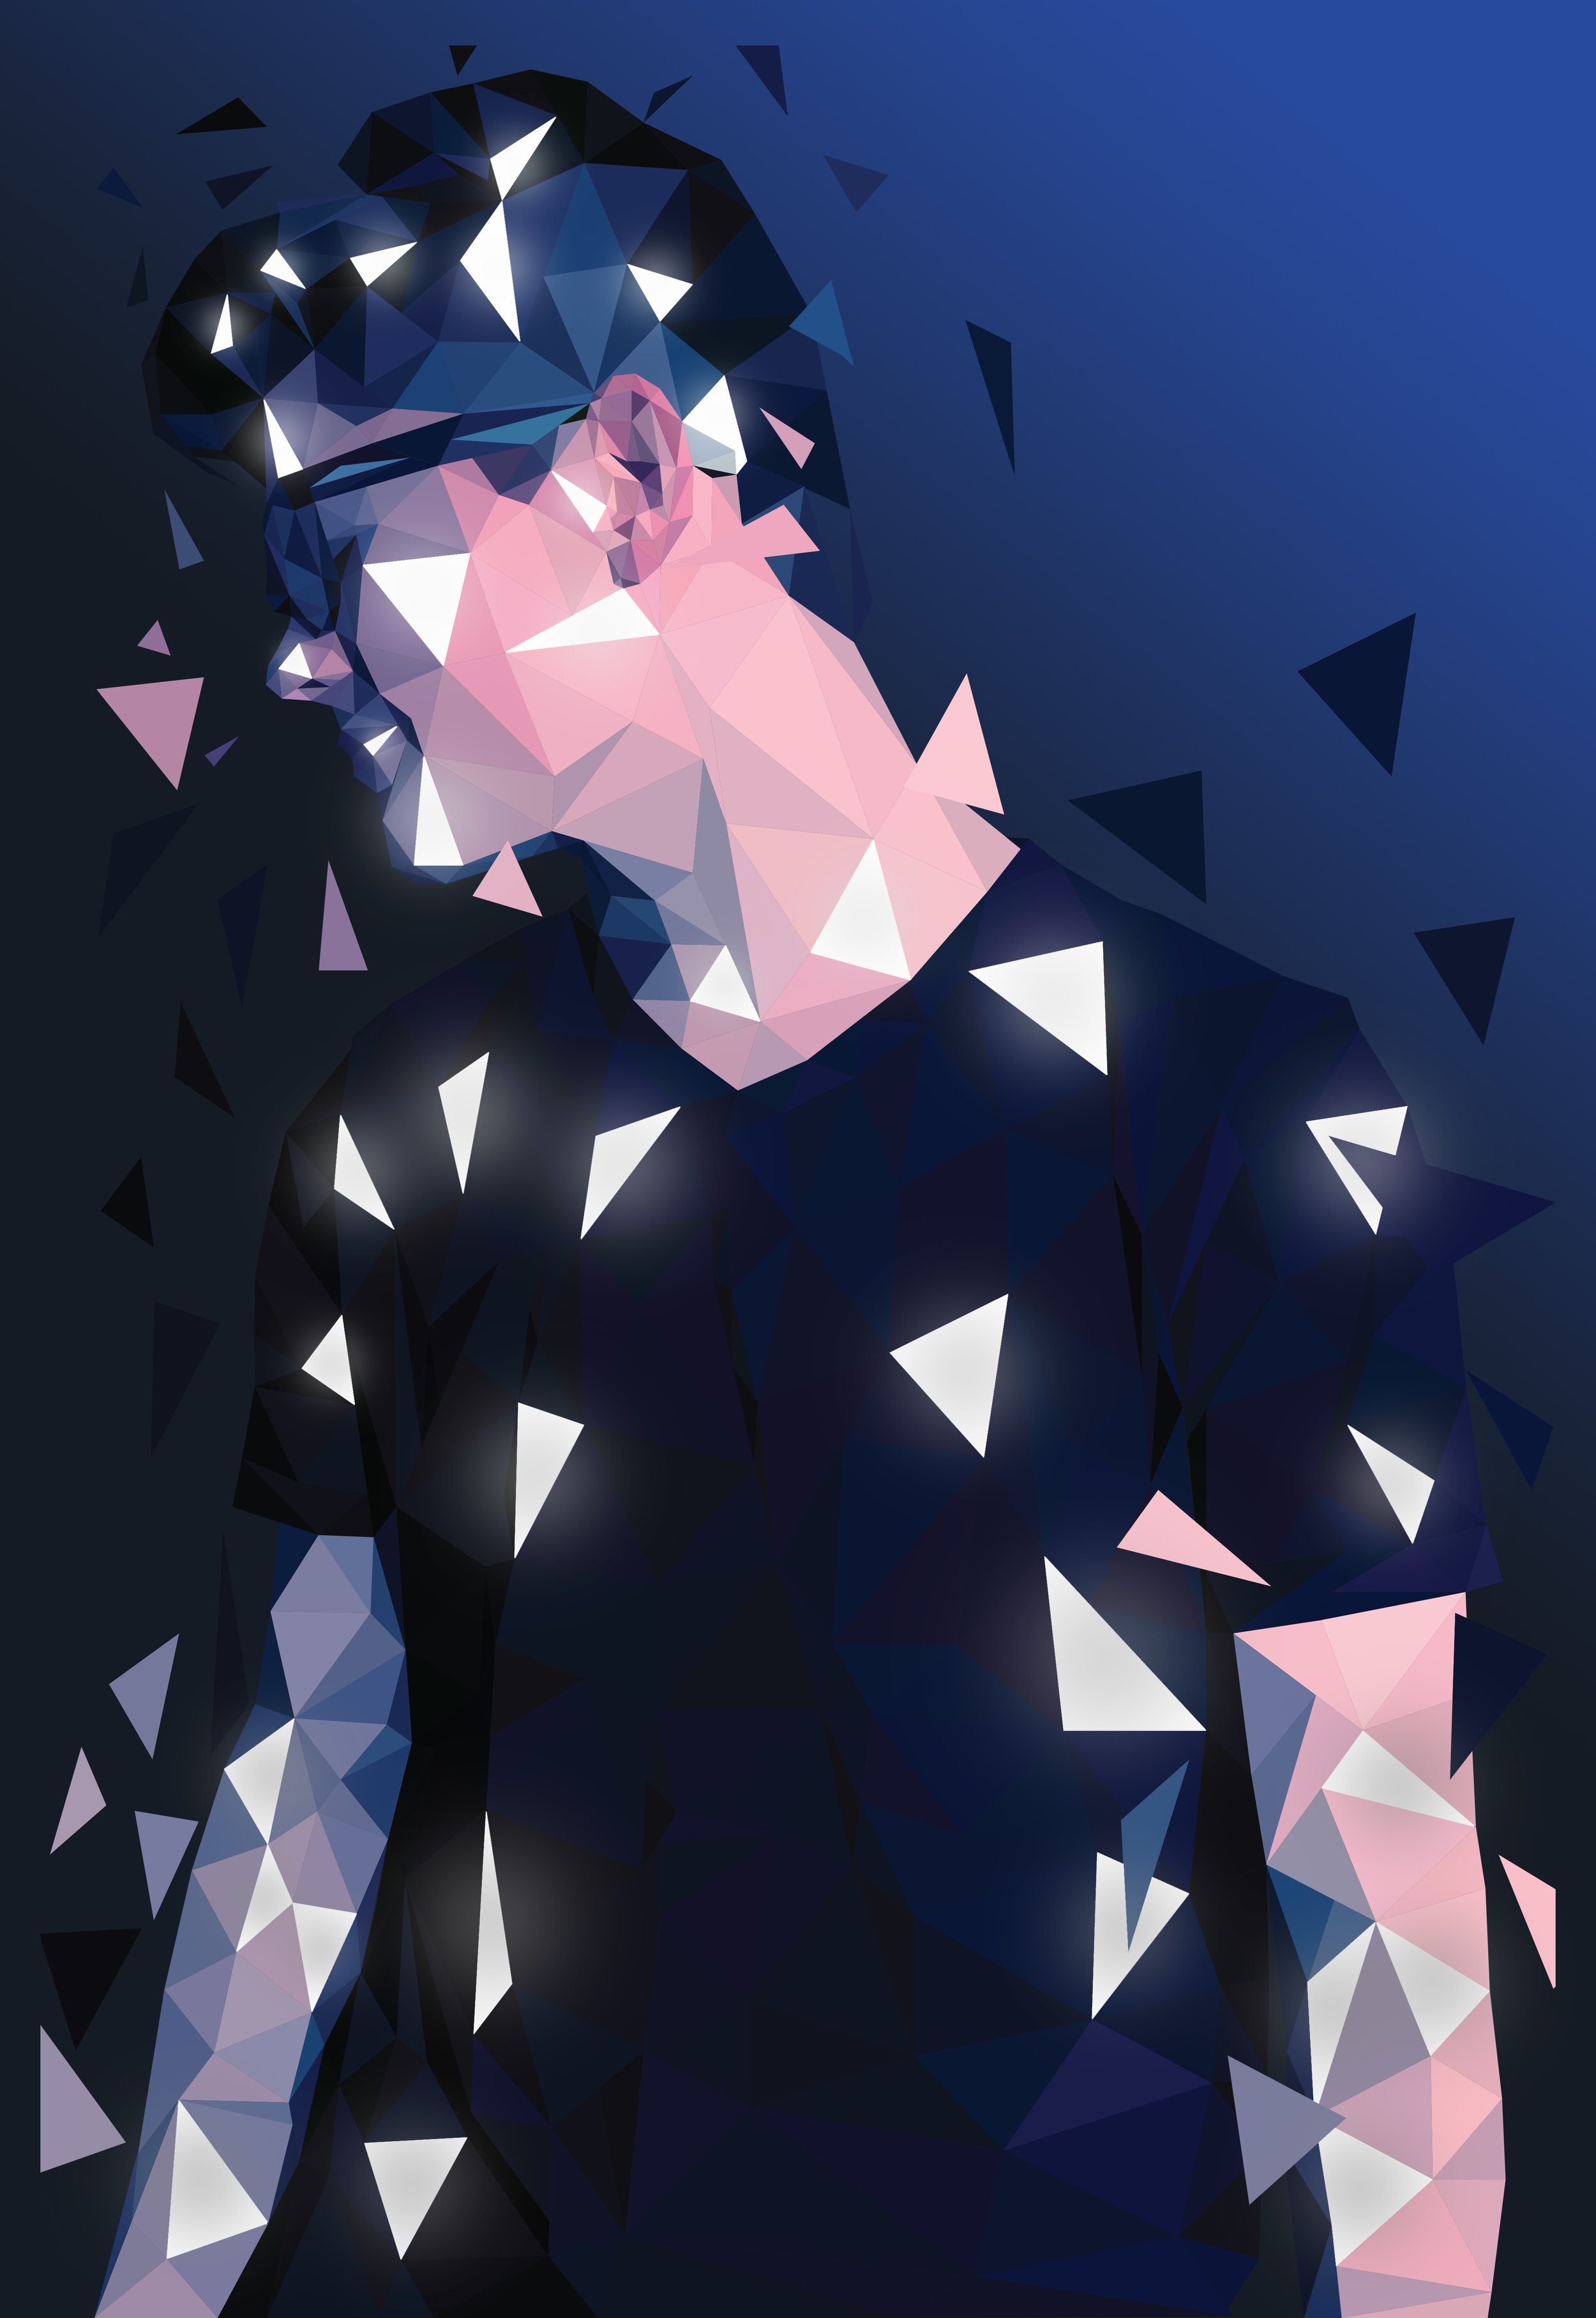 self_portrait_poly_risd_deconstruct_2.jpg